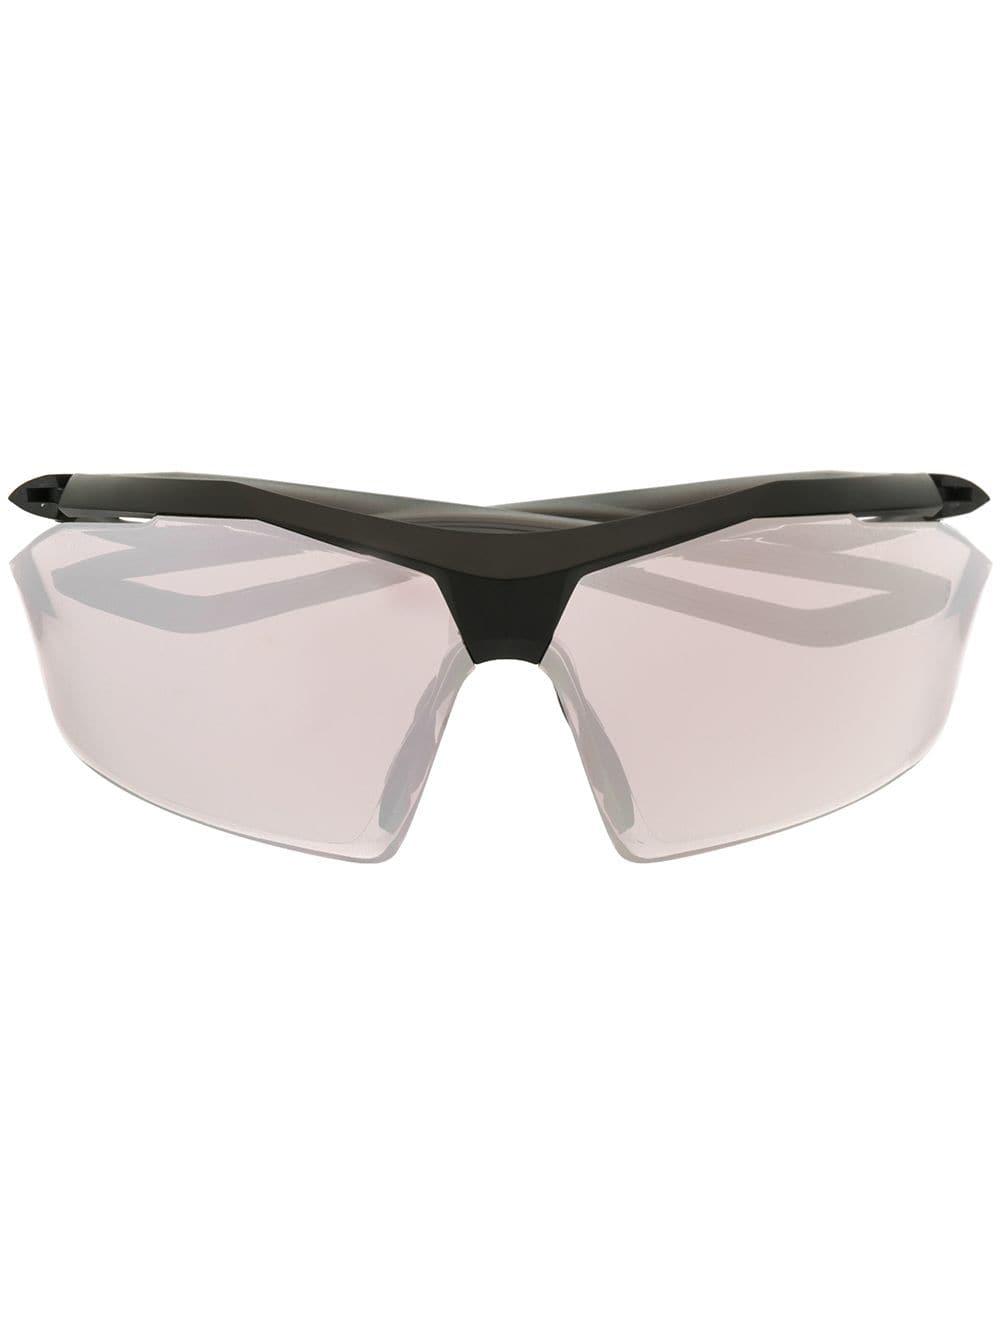 7f07ee7d3 Nike Vaporwing sunglasses - Black - Glami.sk